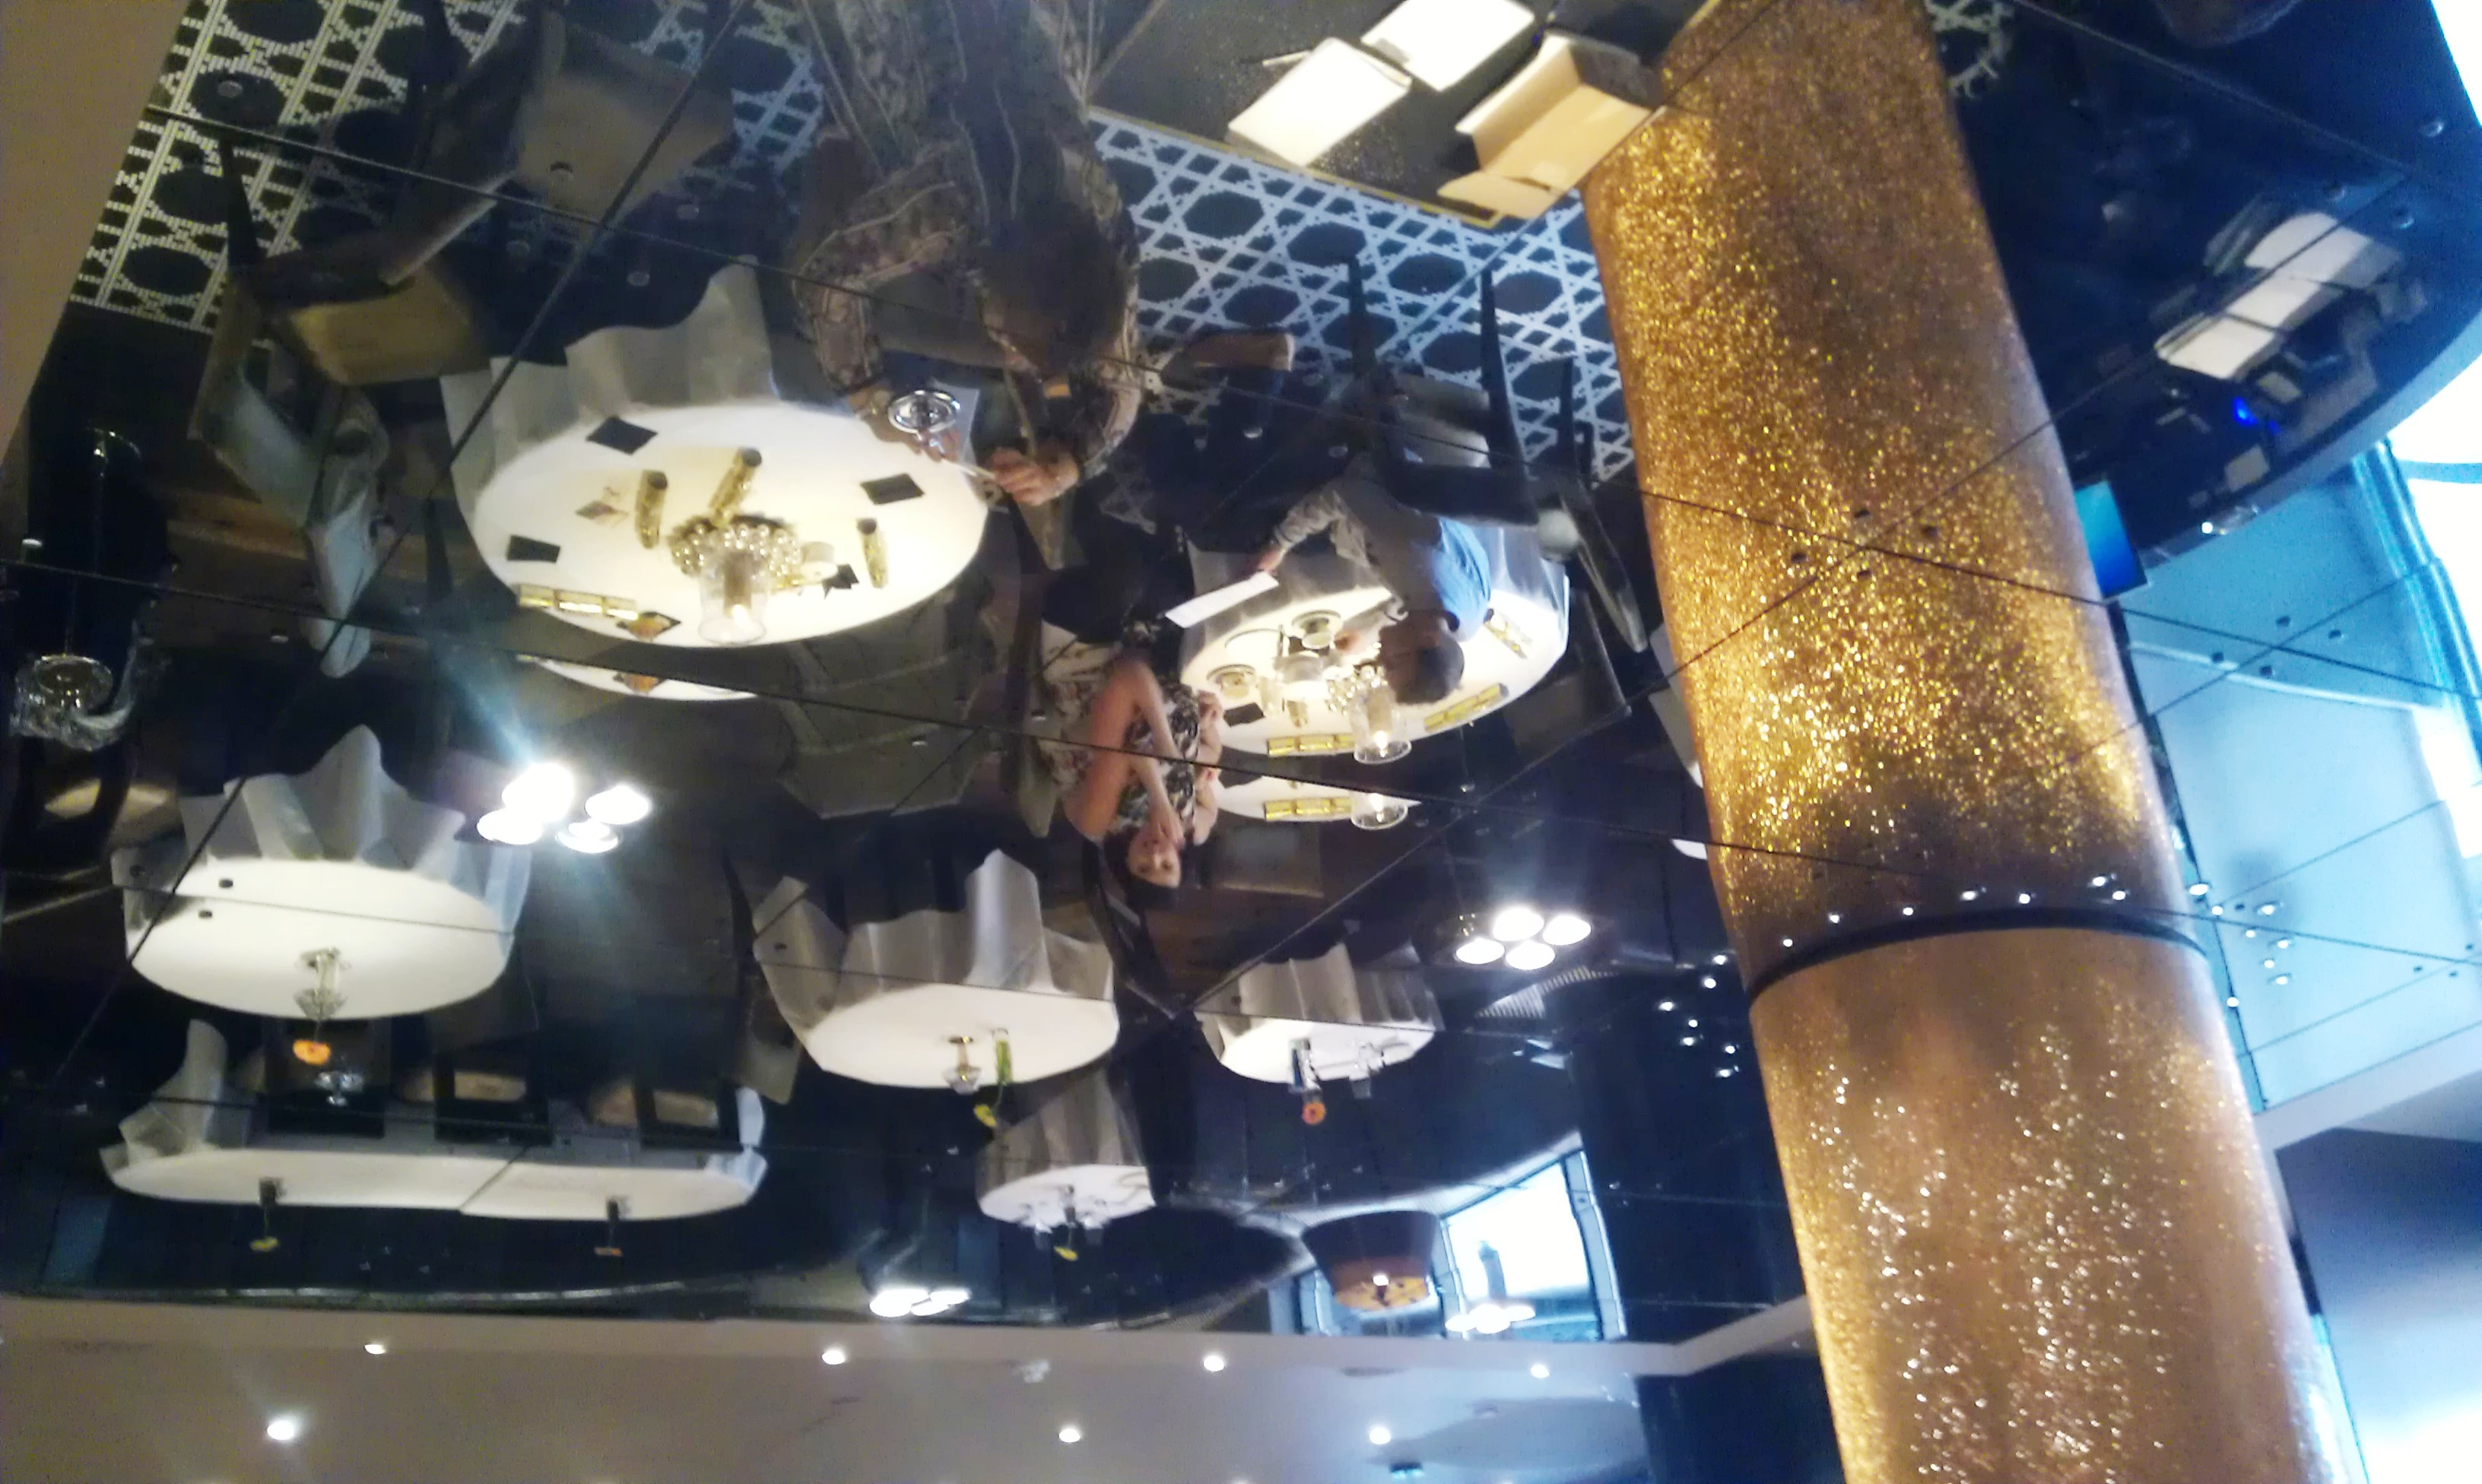 mirrored restaurant ceiling